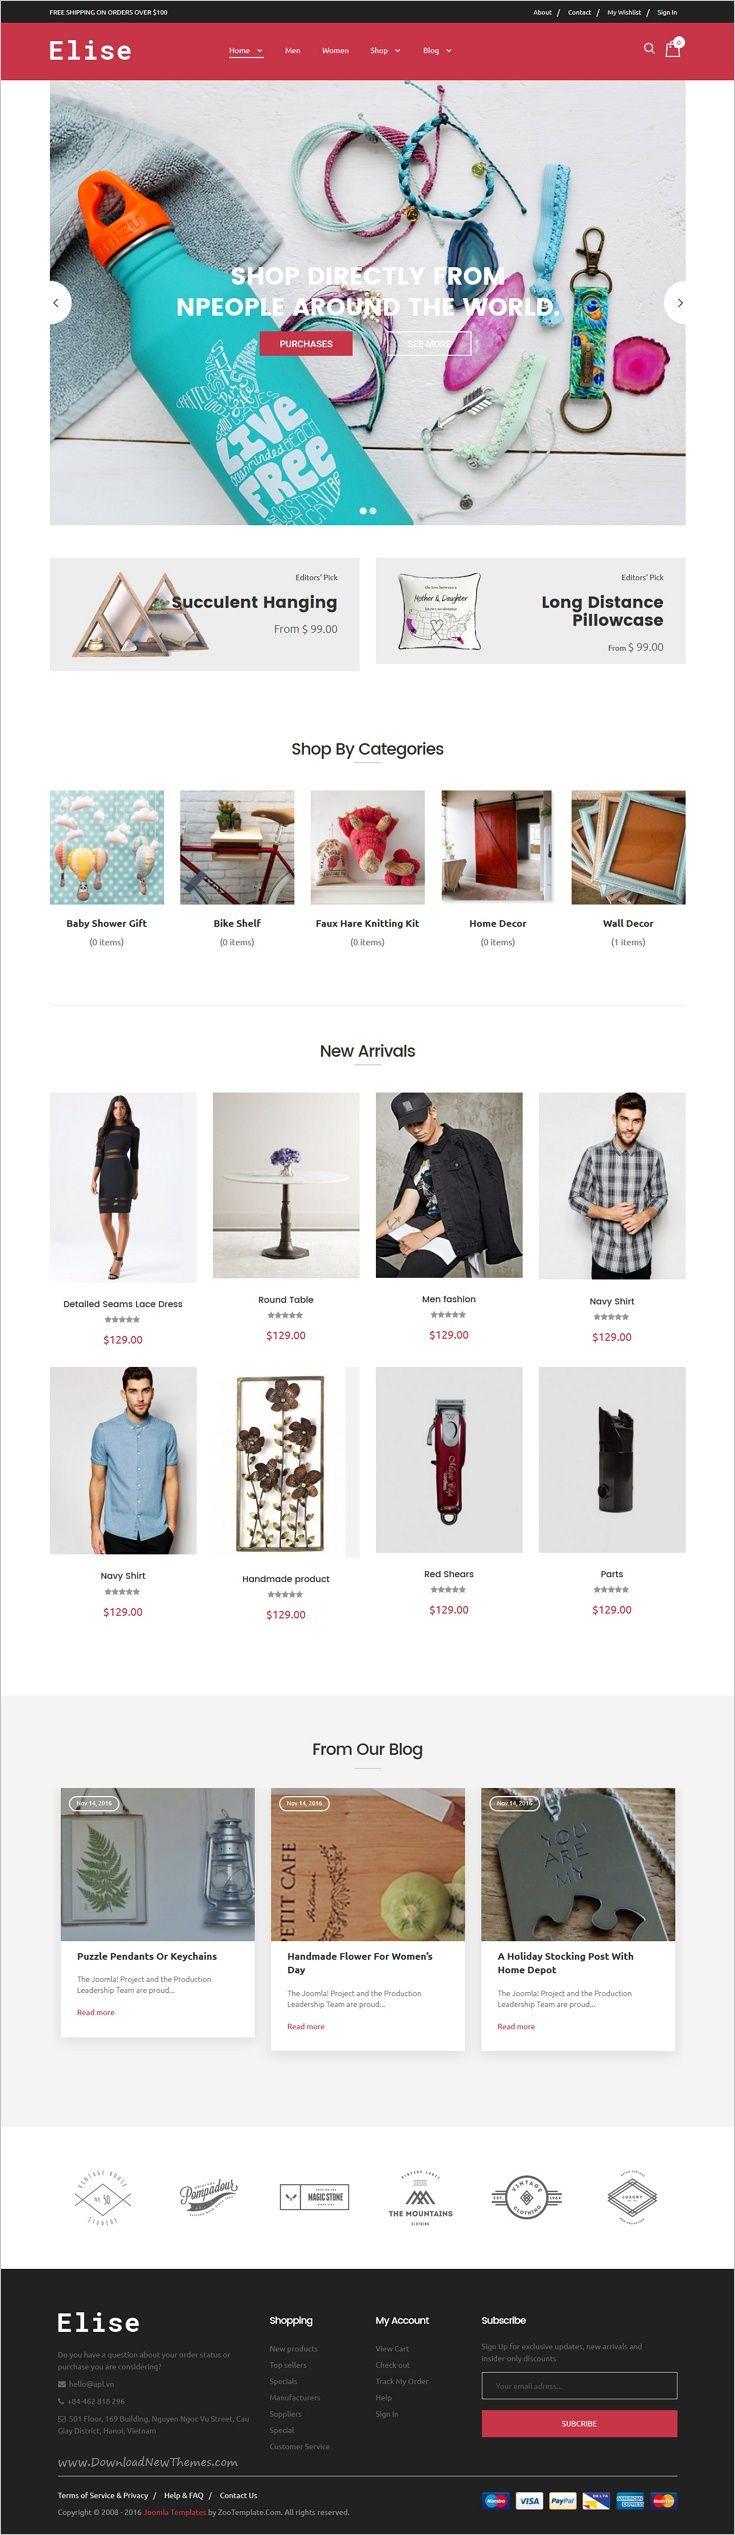 Joomla tshirt design - Elise Responsive Virtuemart Joomla Template